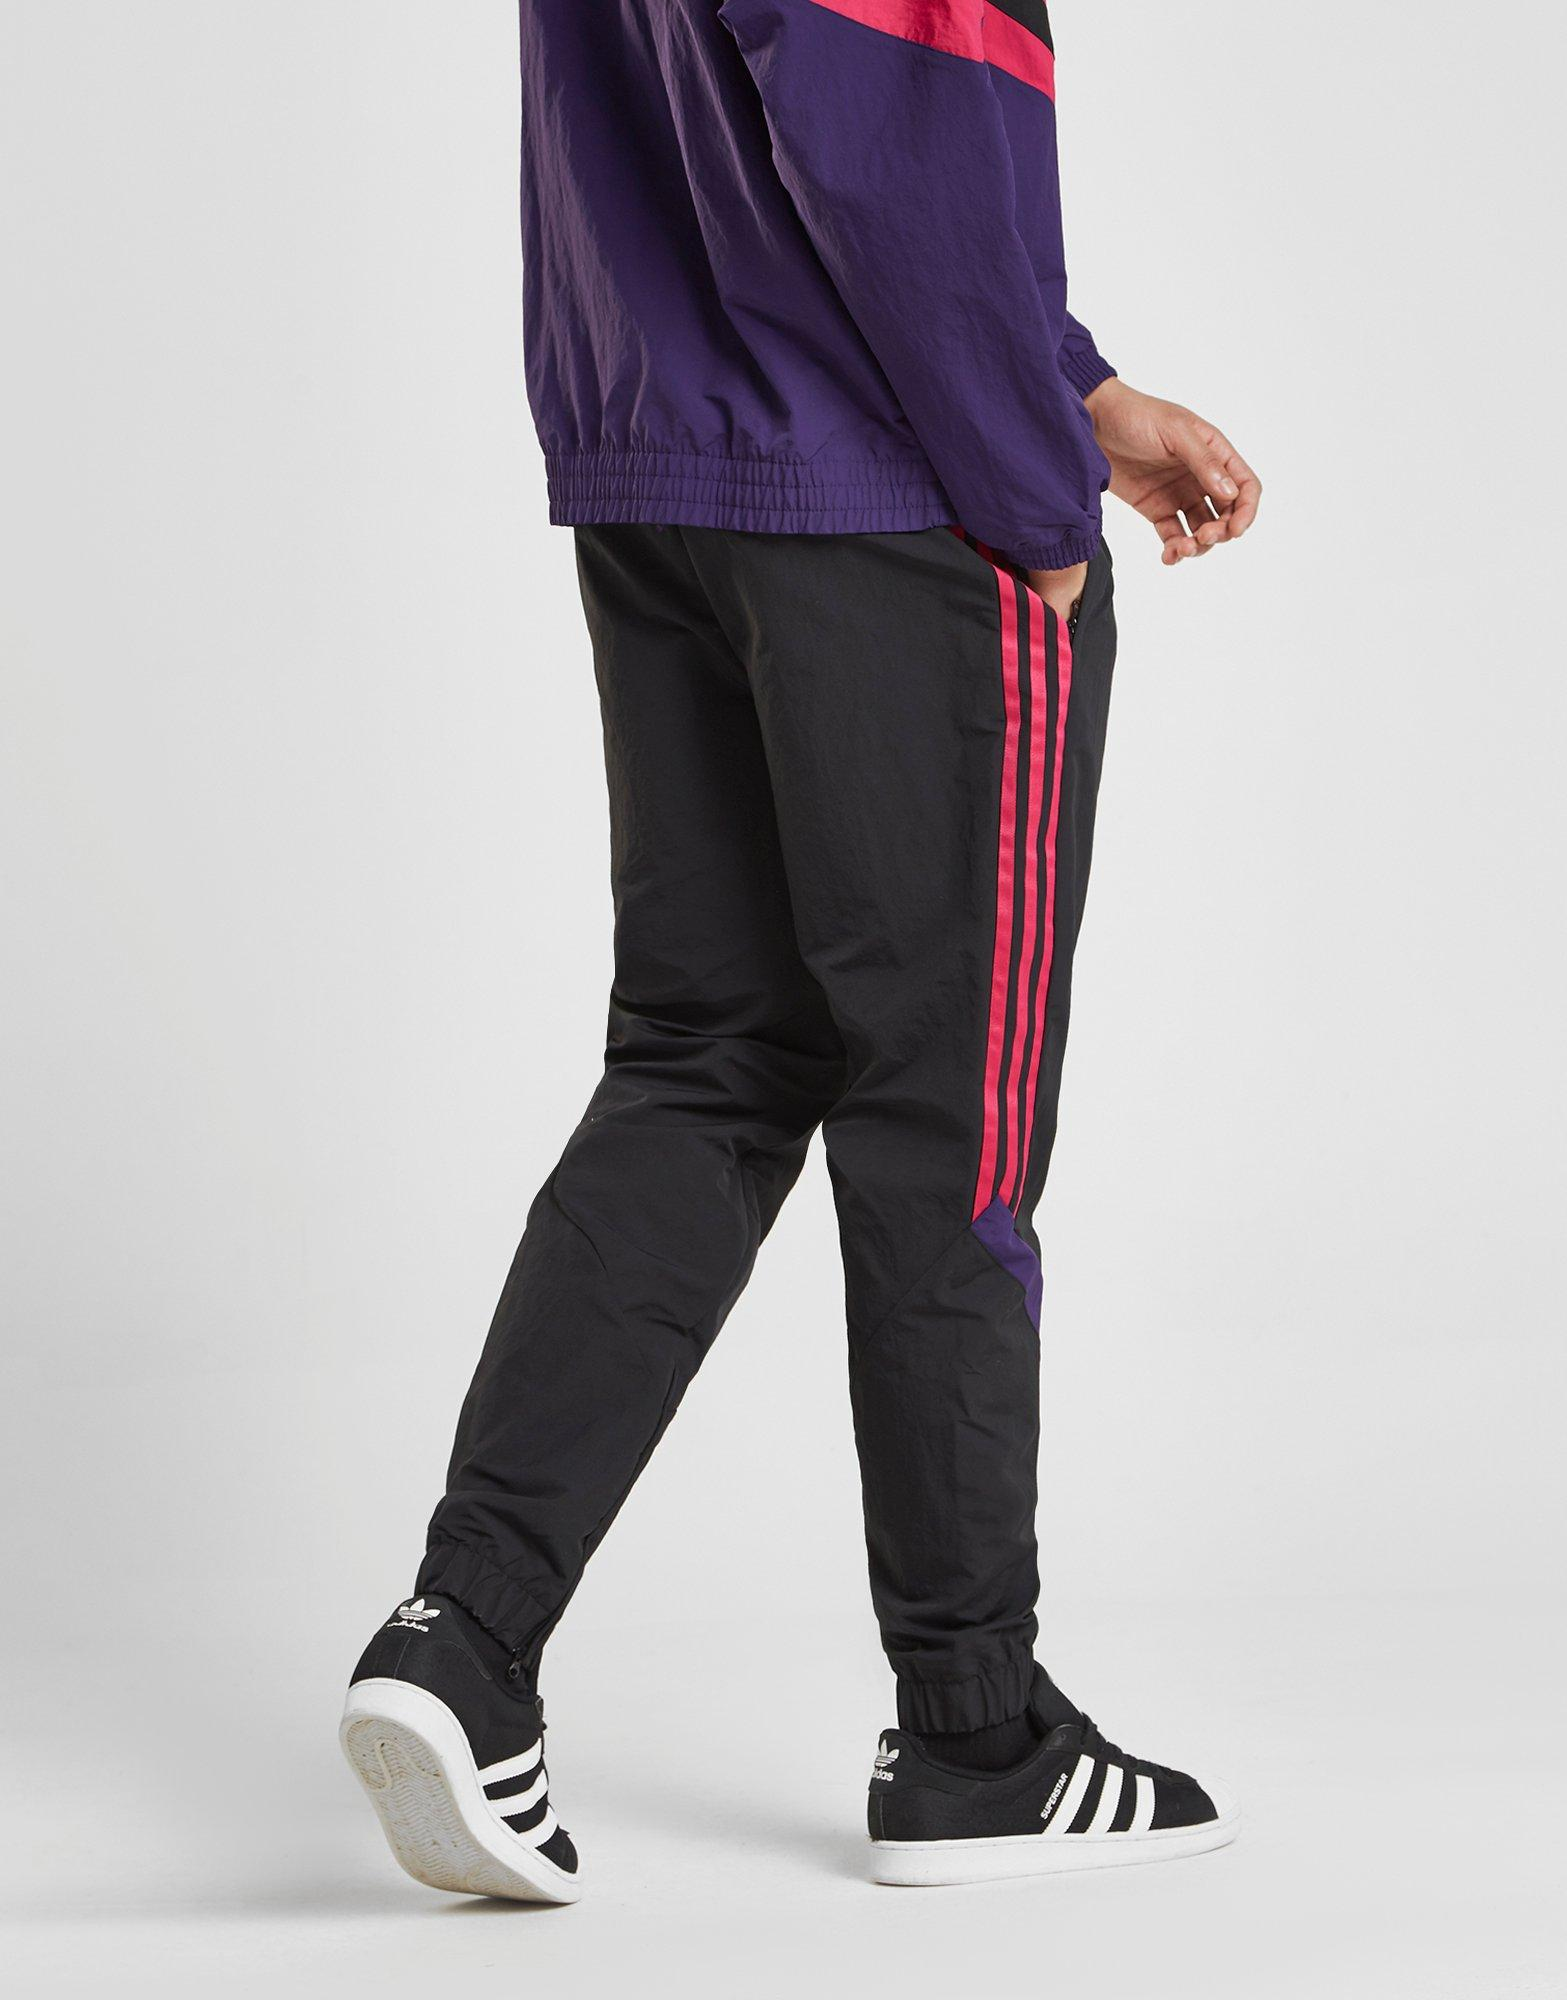 ccf8b00039d446 adidas Originals Sportivo Track Pants in Black for Men - Lyst